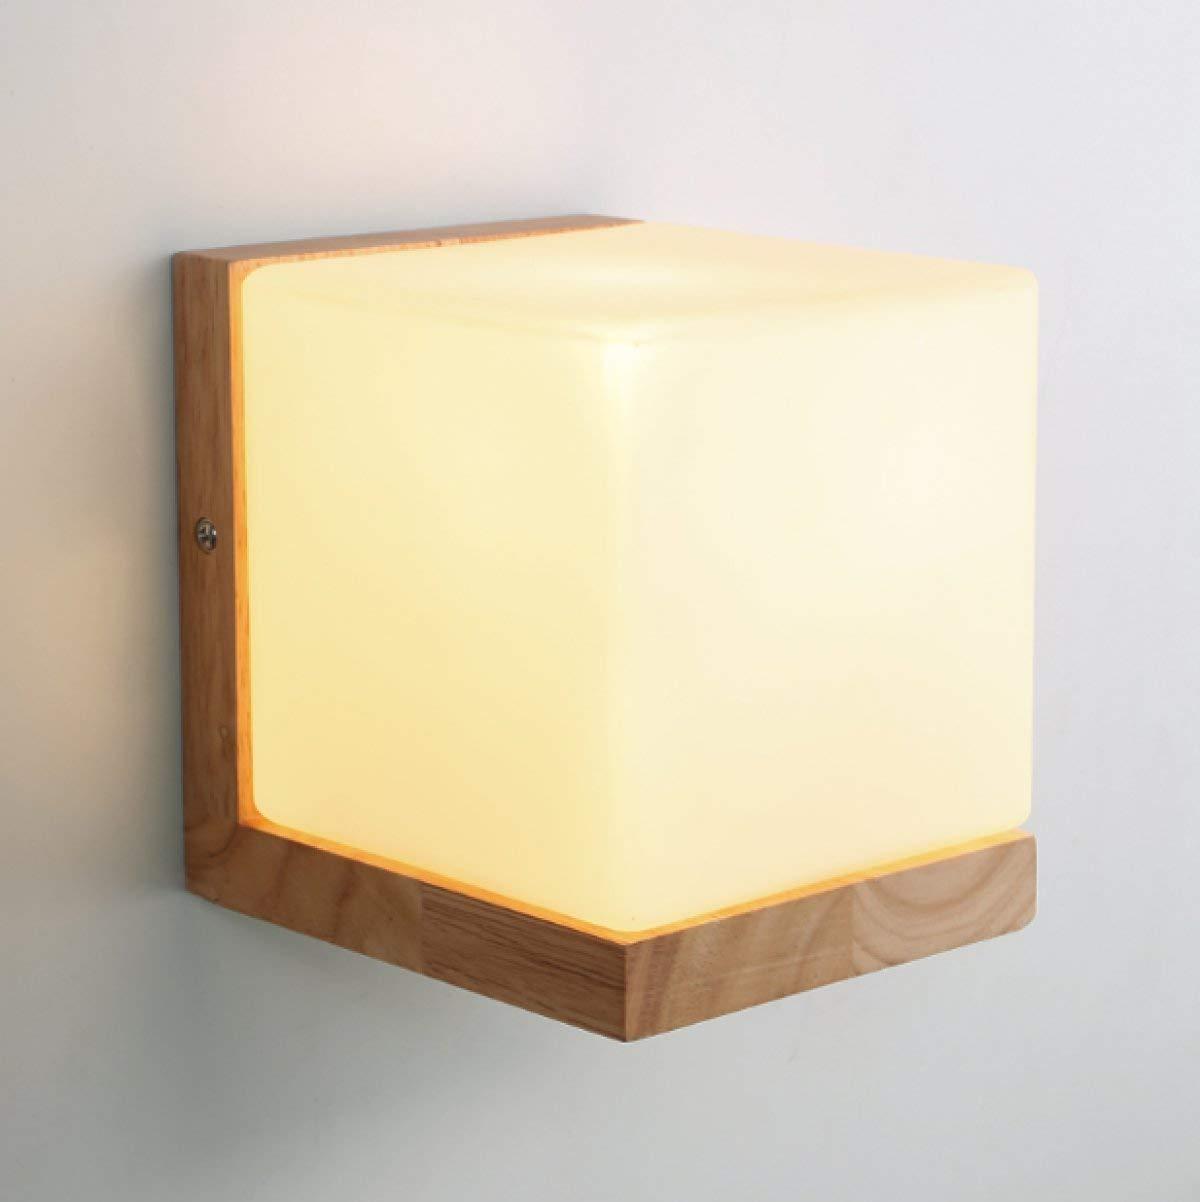 NANIH Home Massivholz Wandleuchte Holz Wandleuchte Schlafzimmer Nachttischlampe Kreative Led Lampe Studie Gang Lampe